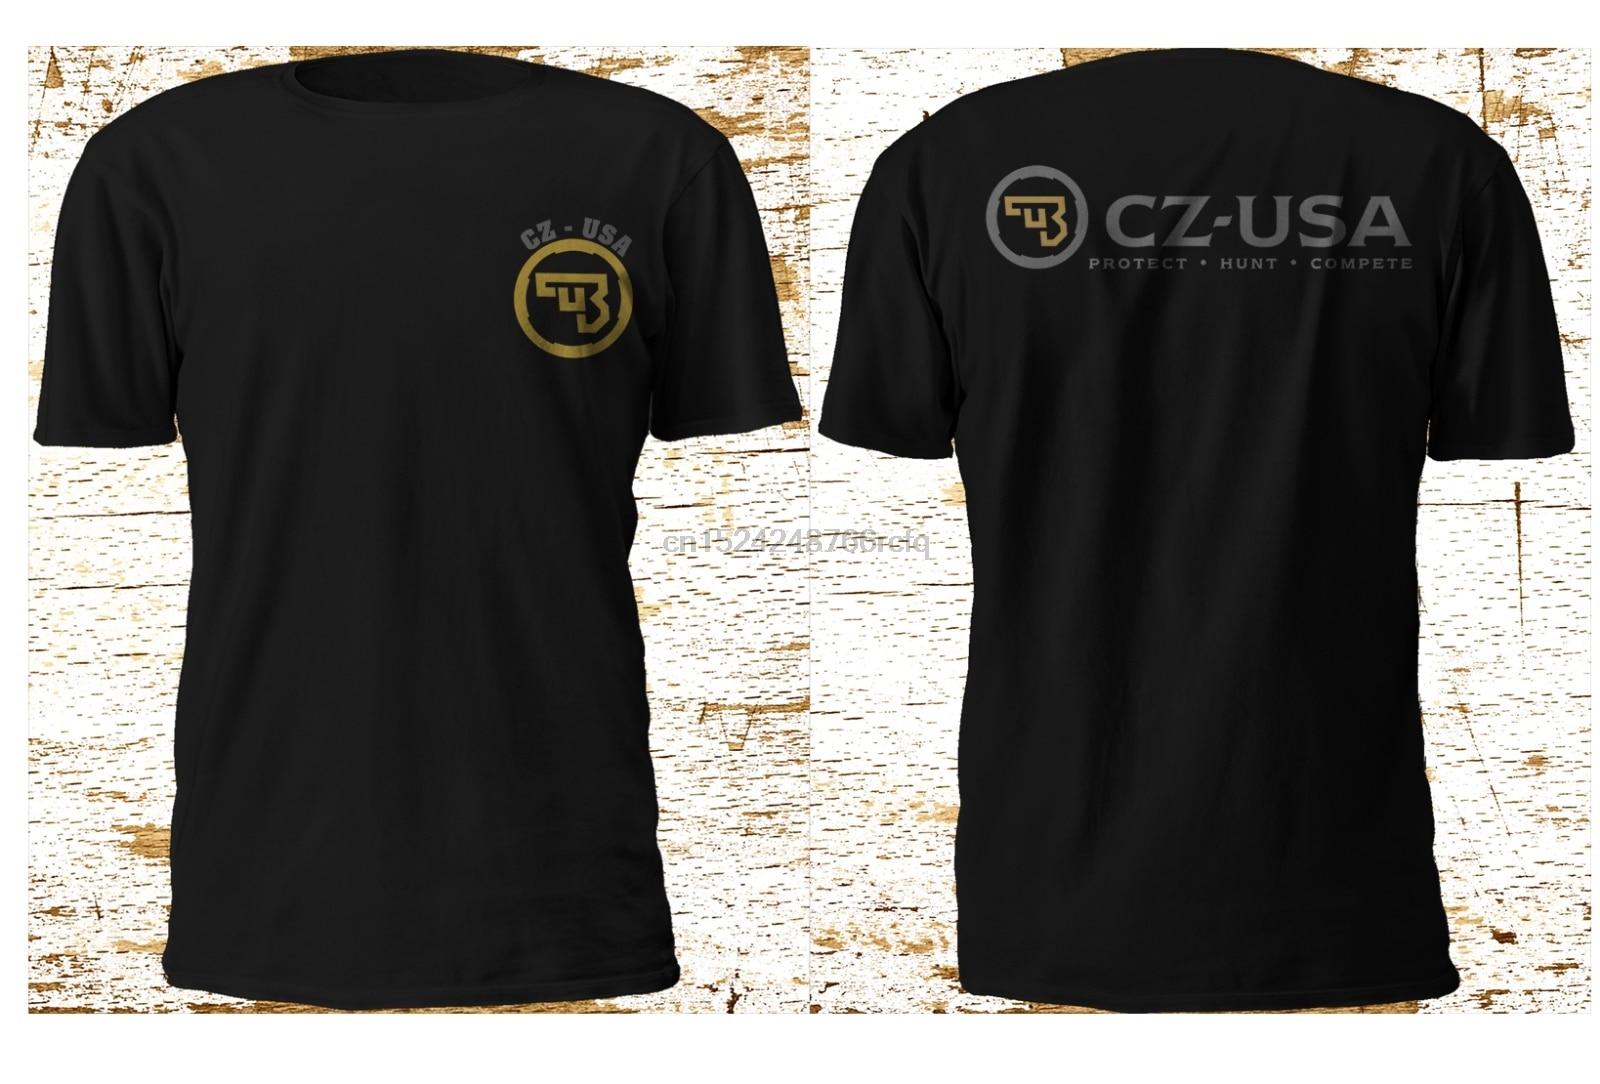 Nueva Cz Usa Ceska Zbrojovka armas de fuego Logo negro camiseta S-3XL